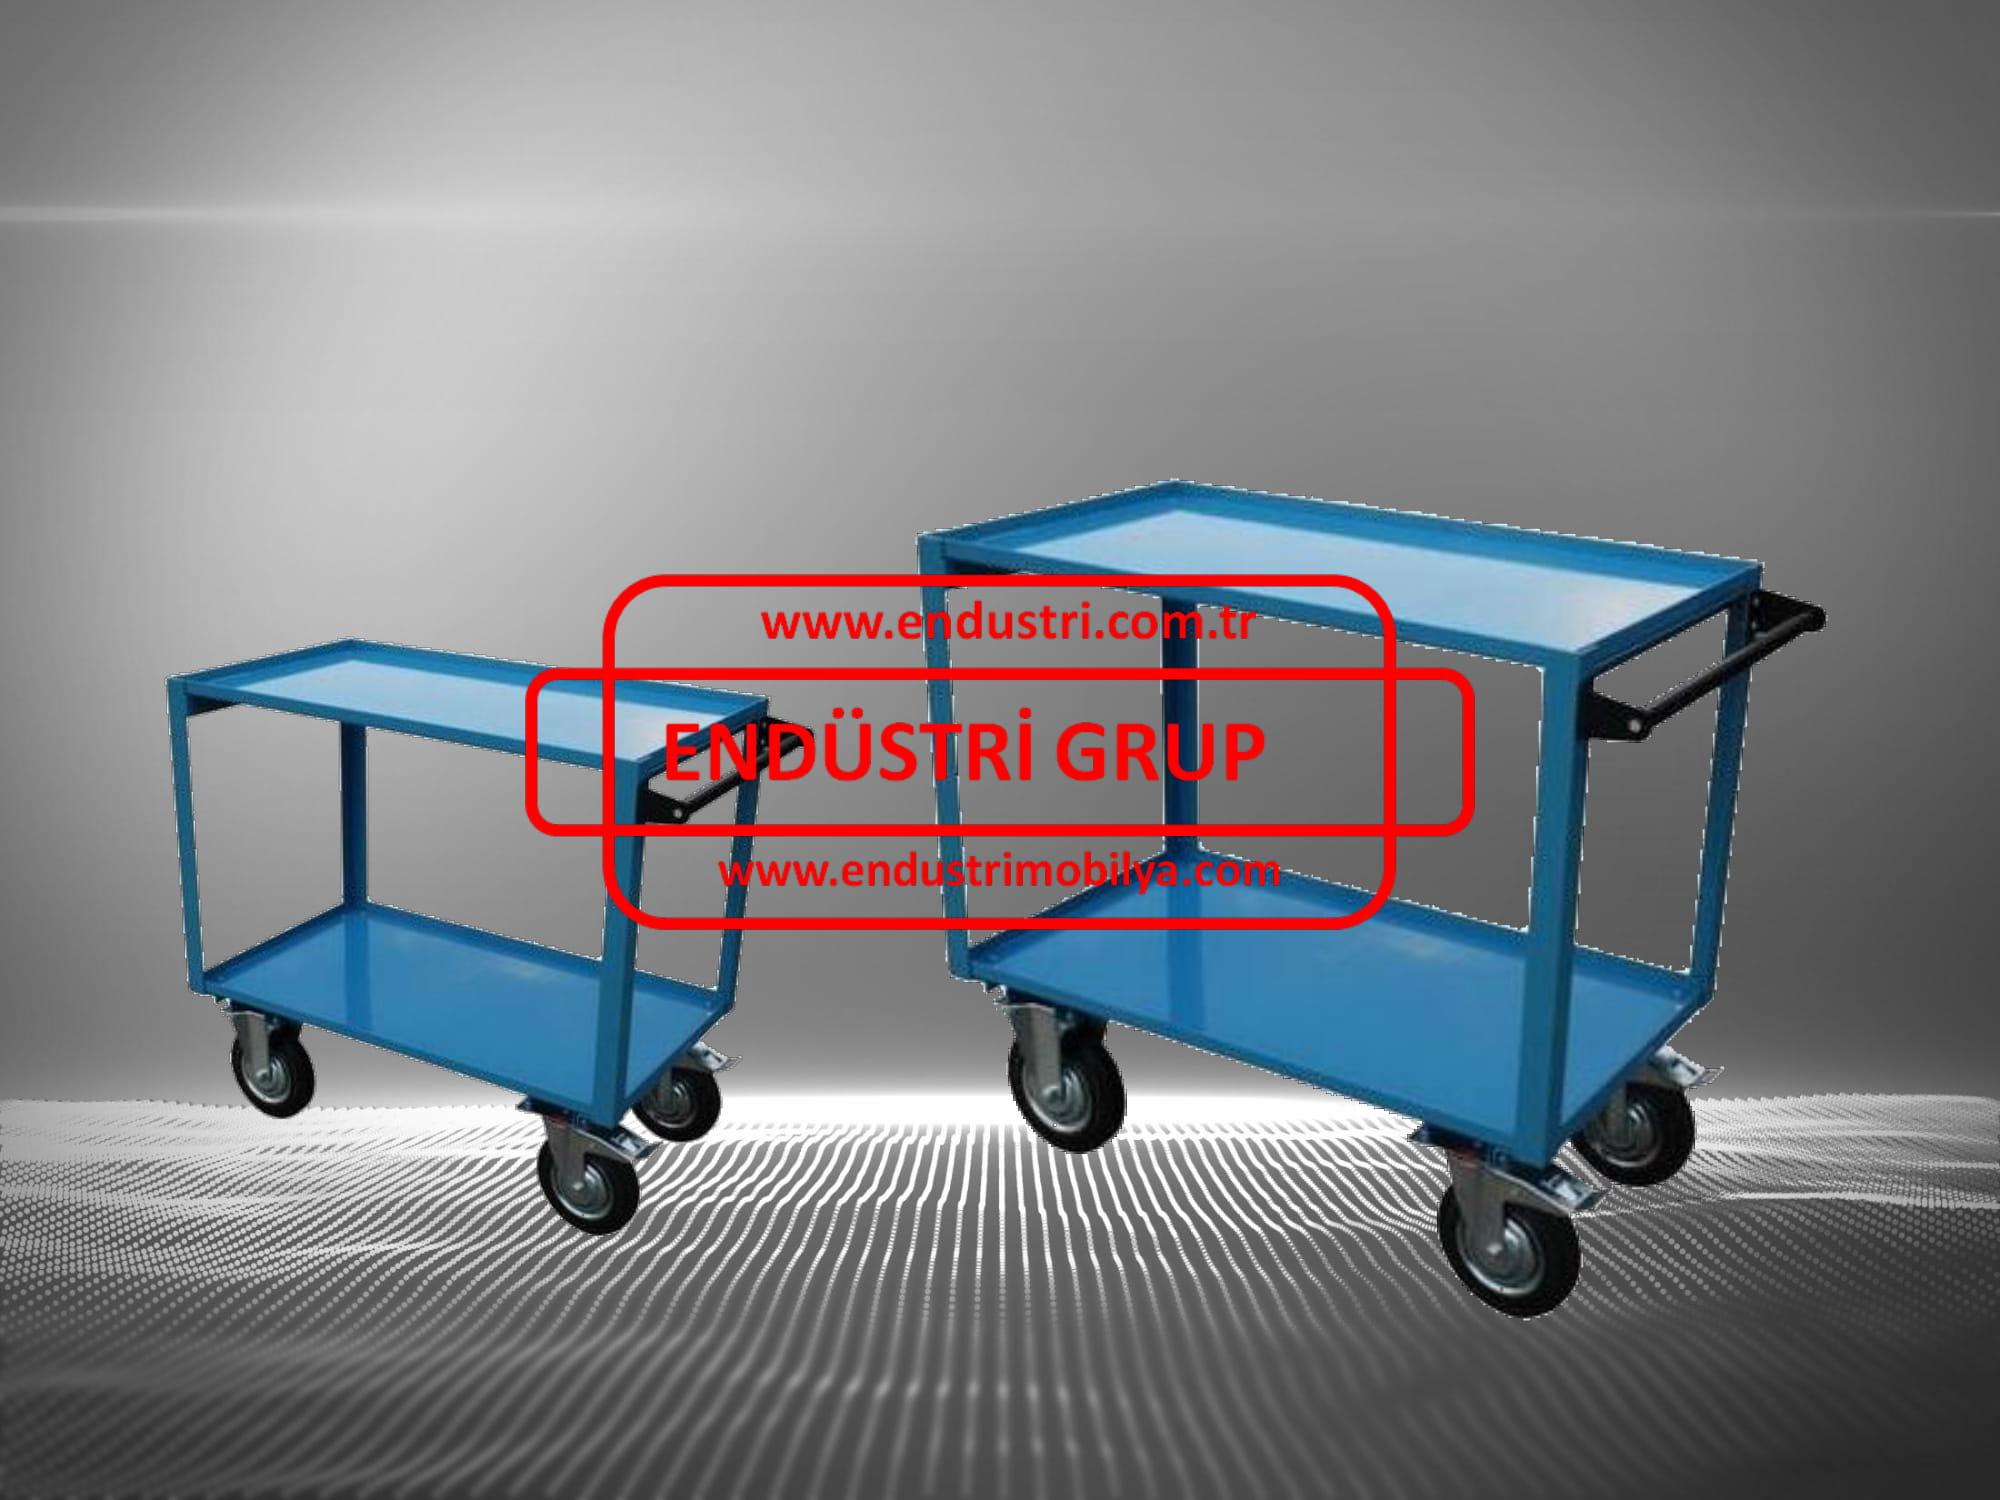 tekerlekli-servis-tamir-tamirci-montaj-sevkiyat-metal-tasima-arabasi-arabalari-fiyati